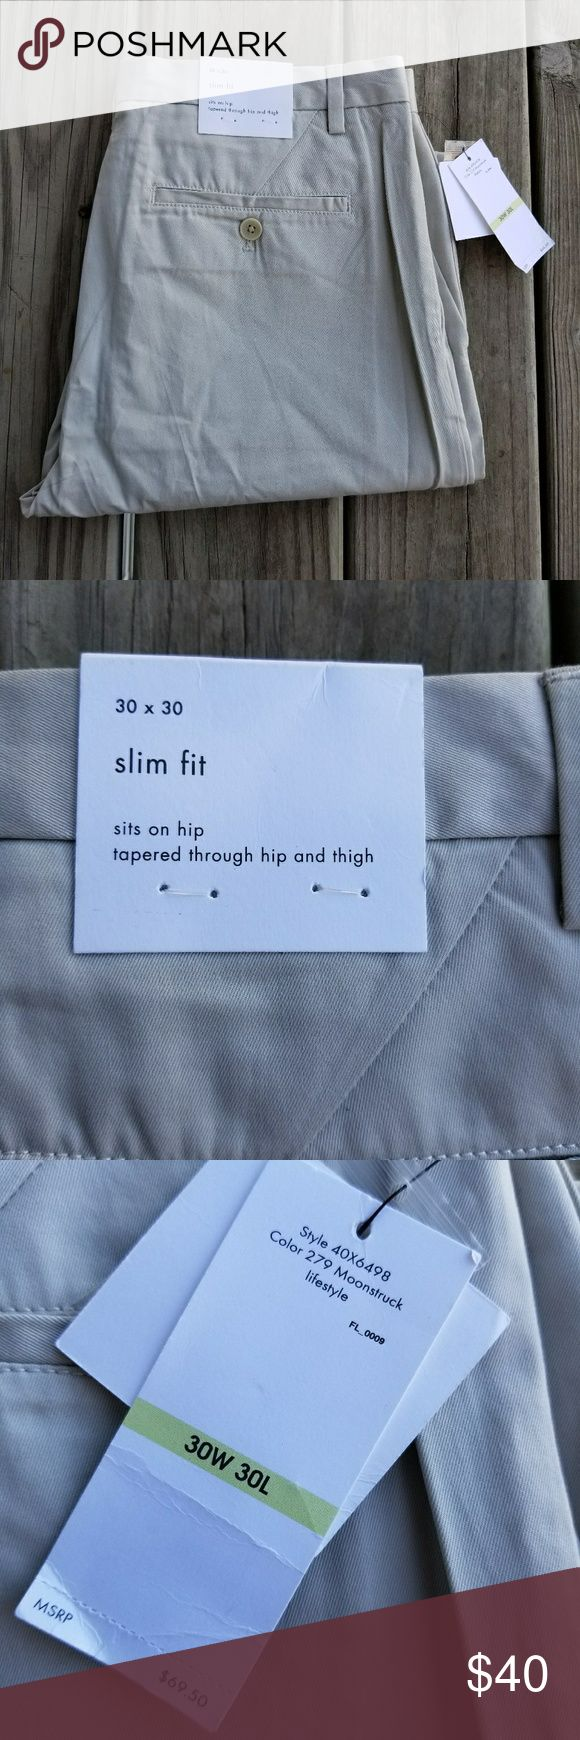 NWT Calvin Klein slim fit khaki dress pants NWT Calvin Klein slim fit khaki dress pants in size  30 waist x 30 length.  Bundle for a discount or make an offer!  044 Calvin Klein Pants Chinos & Khakis